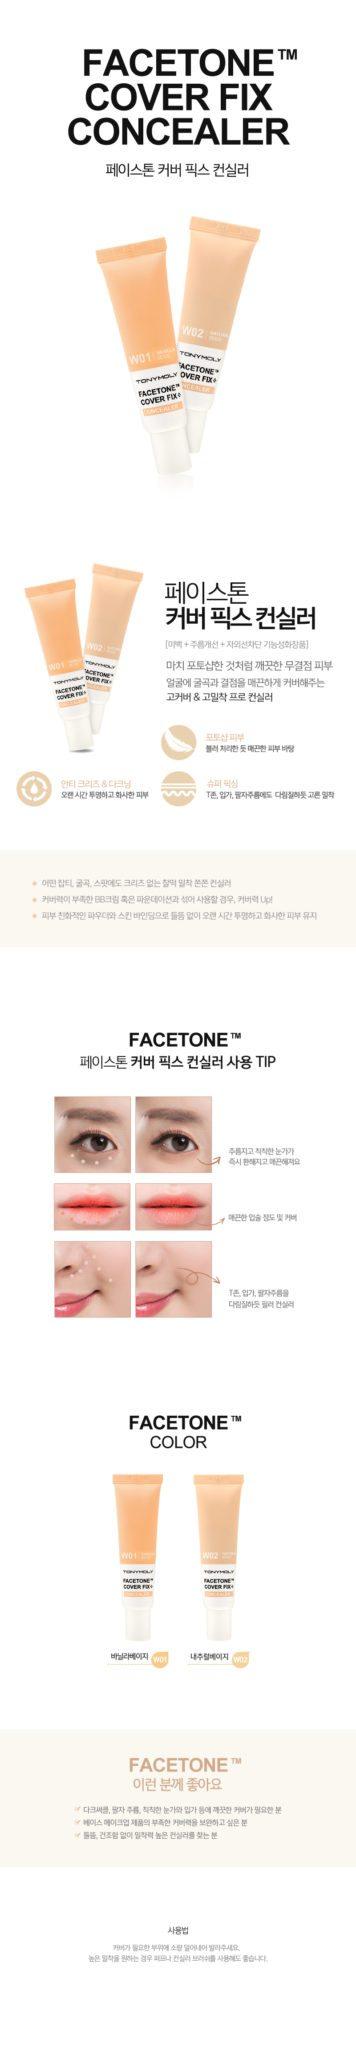 Tonymoly Facetone Cover Fix Concealer Spf 30 Seoul Next